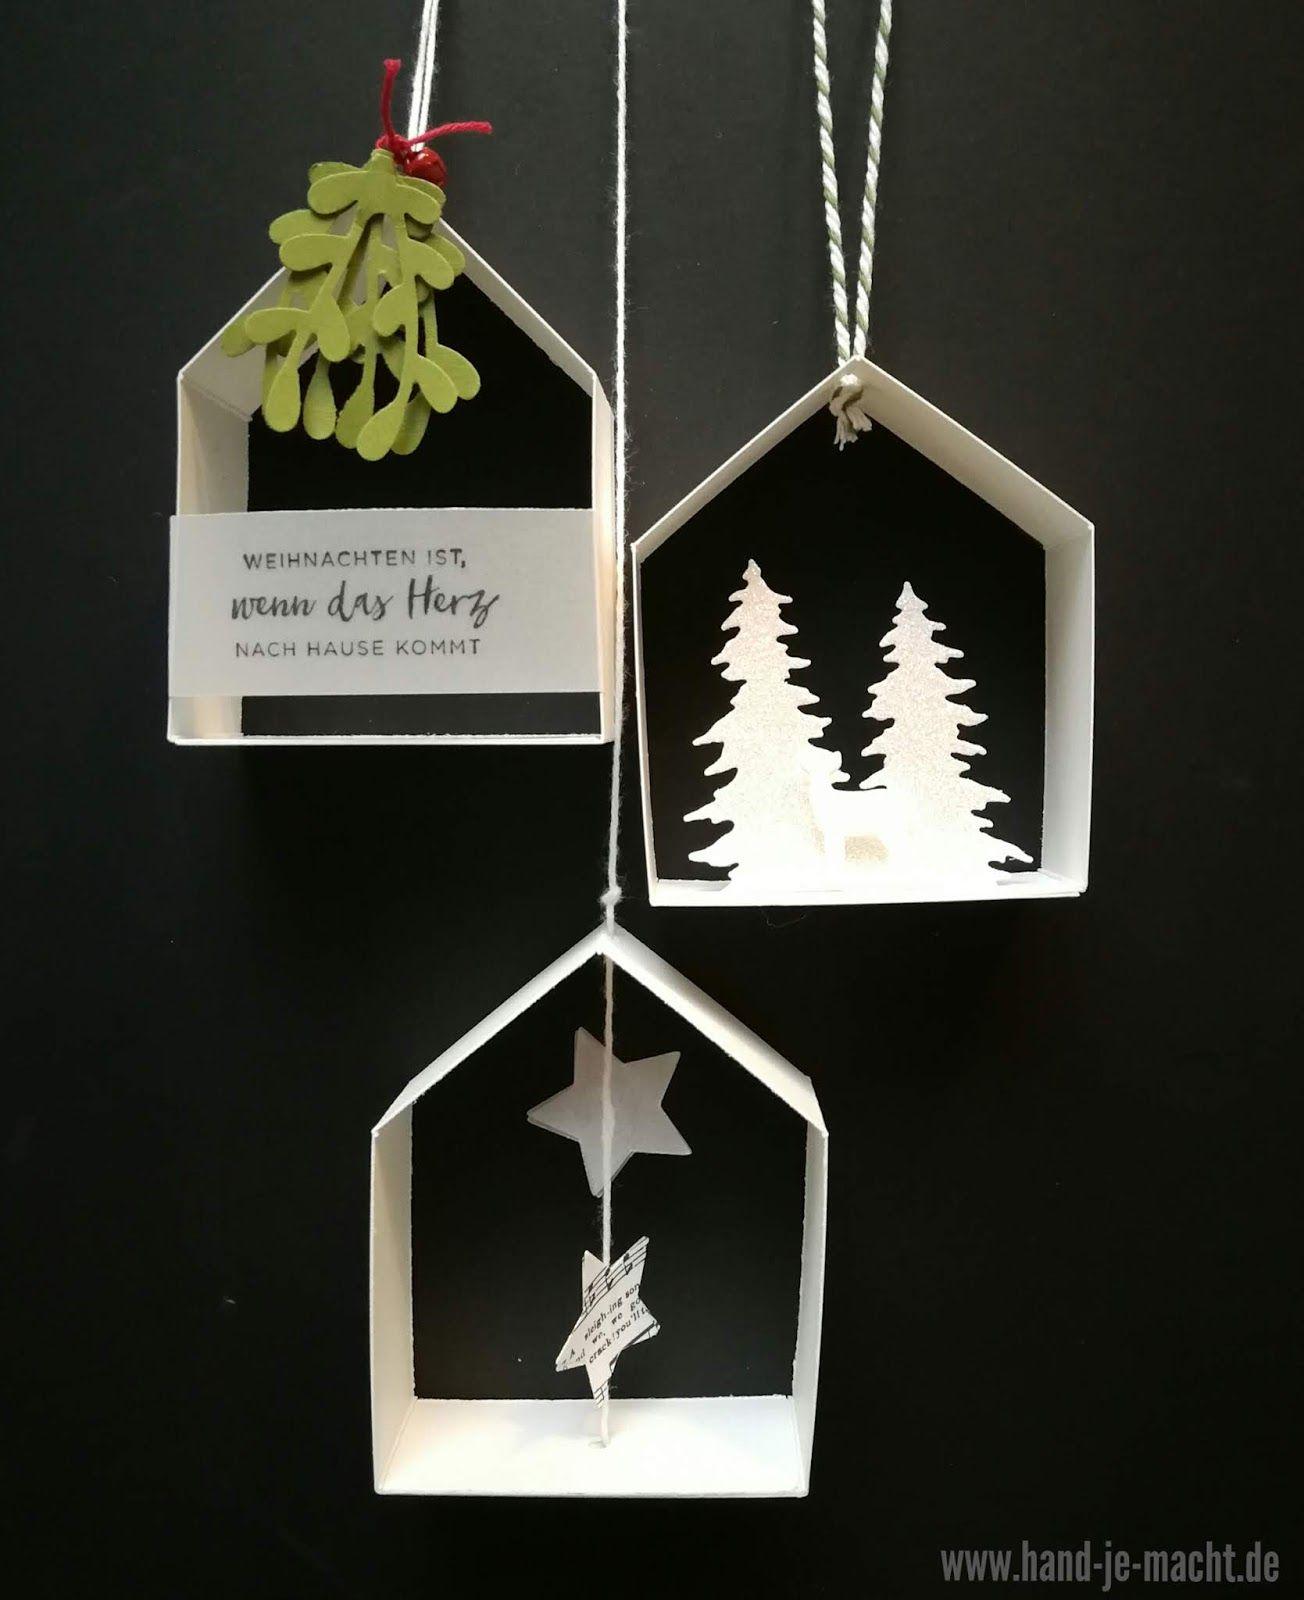 h uschen anh nger karten bastelideen weihnachten deko. Black Bedroom Furniture Sets. Home Design Ideas